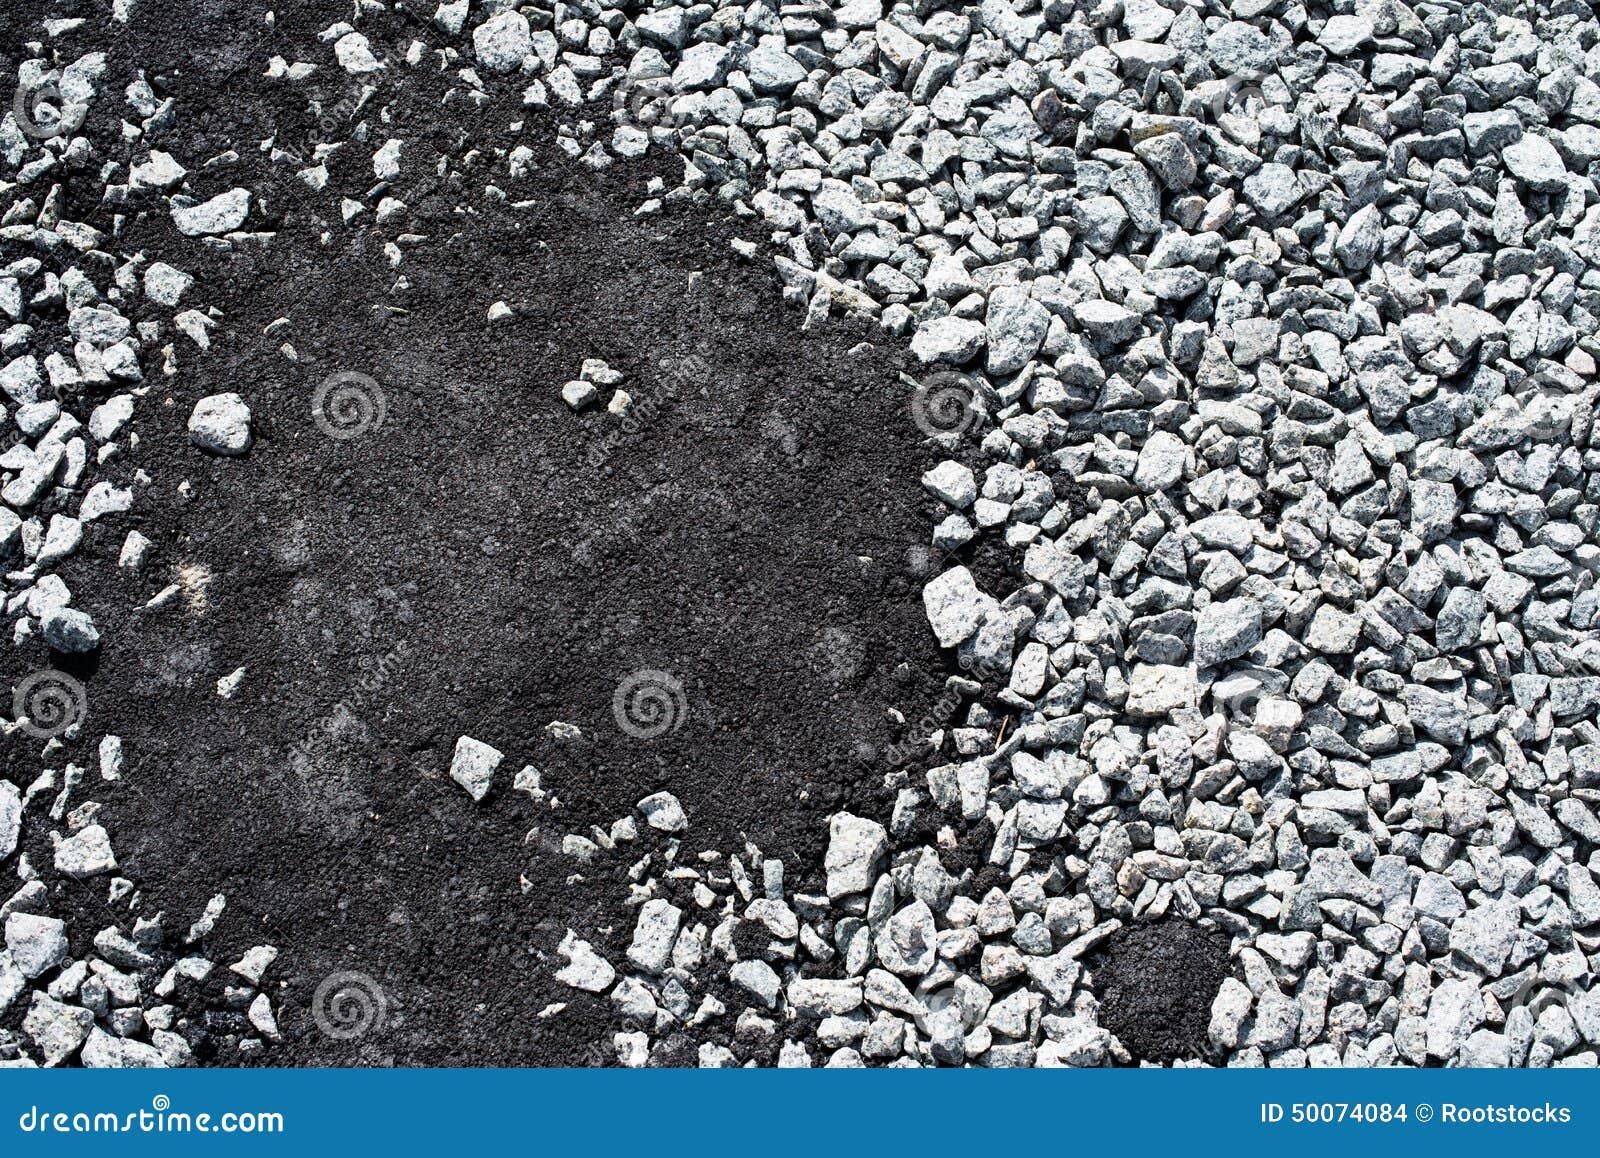 Download Crushed Stones Partly Covered With New Asphalt Concrete Stock Photo - Image of asphalt, broken: 50074084